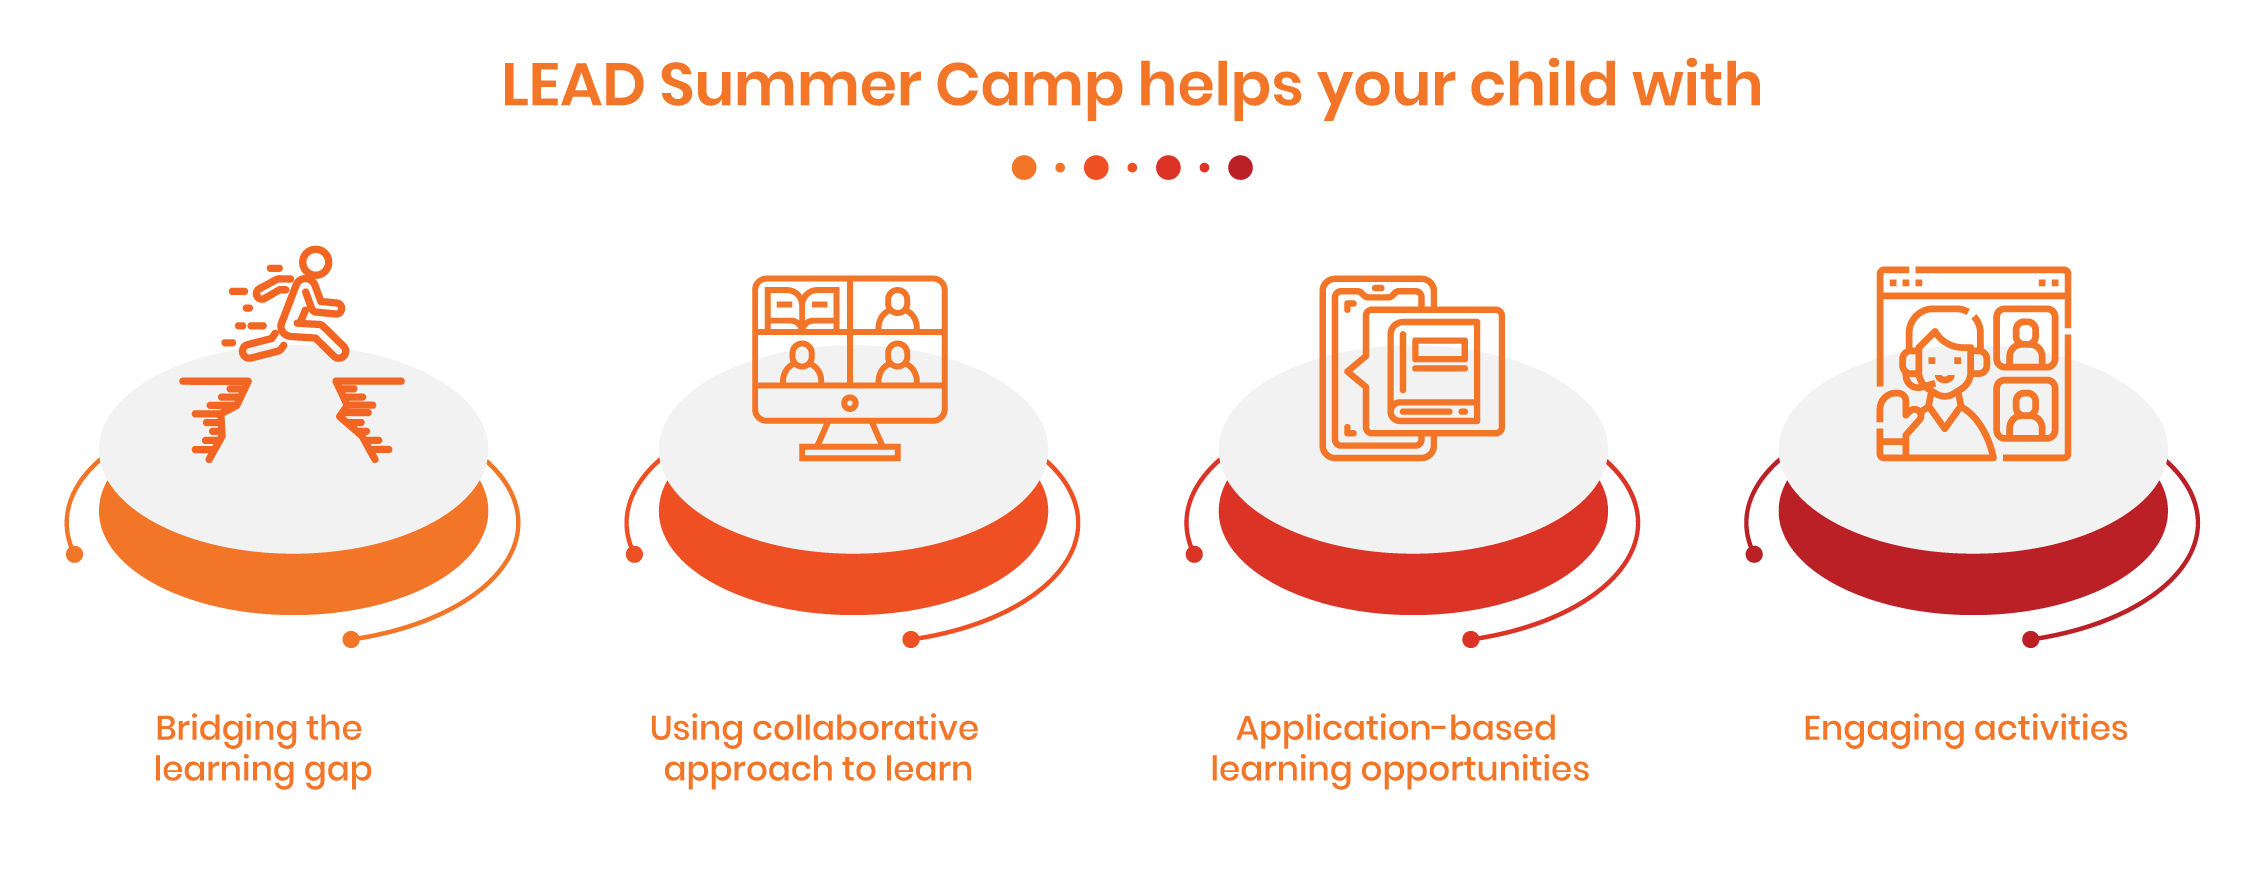 Summer cap for kids